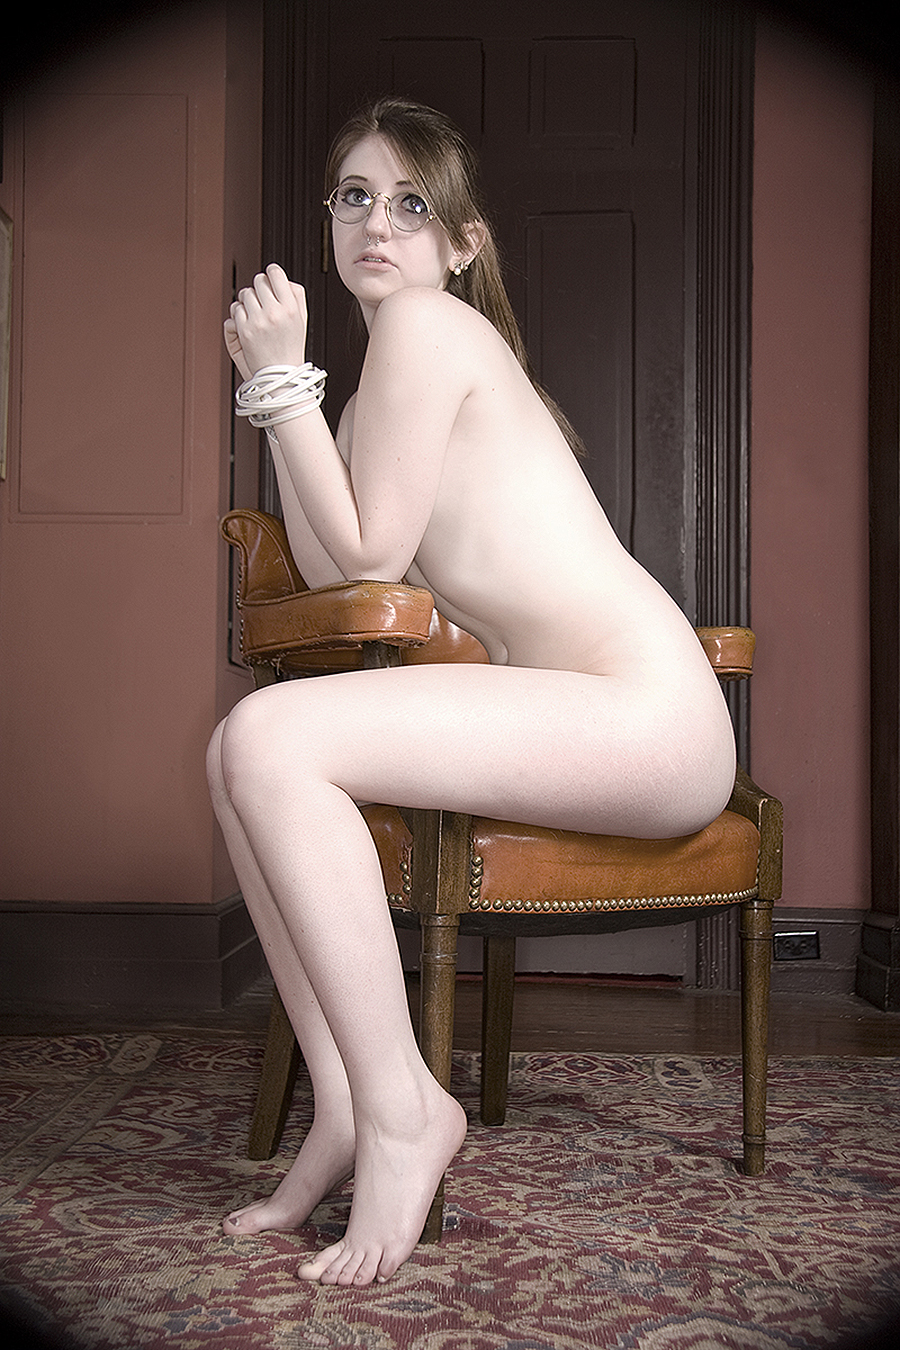 Tony_Ward_Studio_Philo_Project_model_Jennie_Shapiro_UPenn_Philomathean_Society_2012_nudes_erotica_bondage_photography_ivy_league